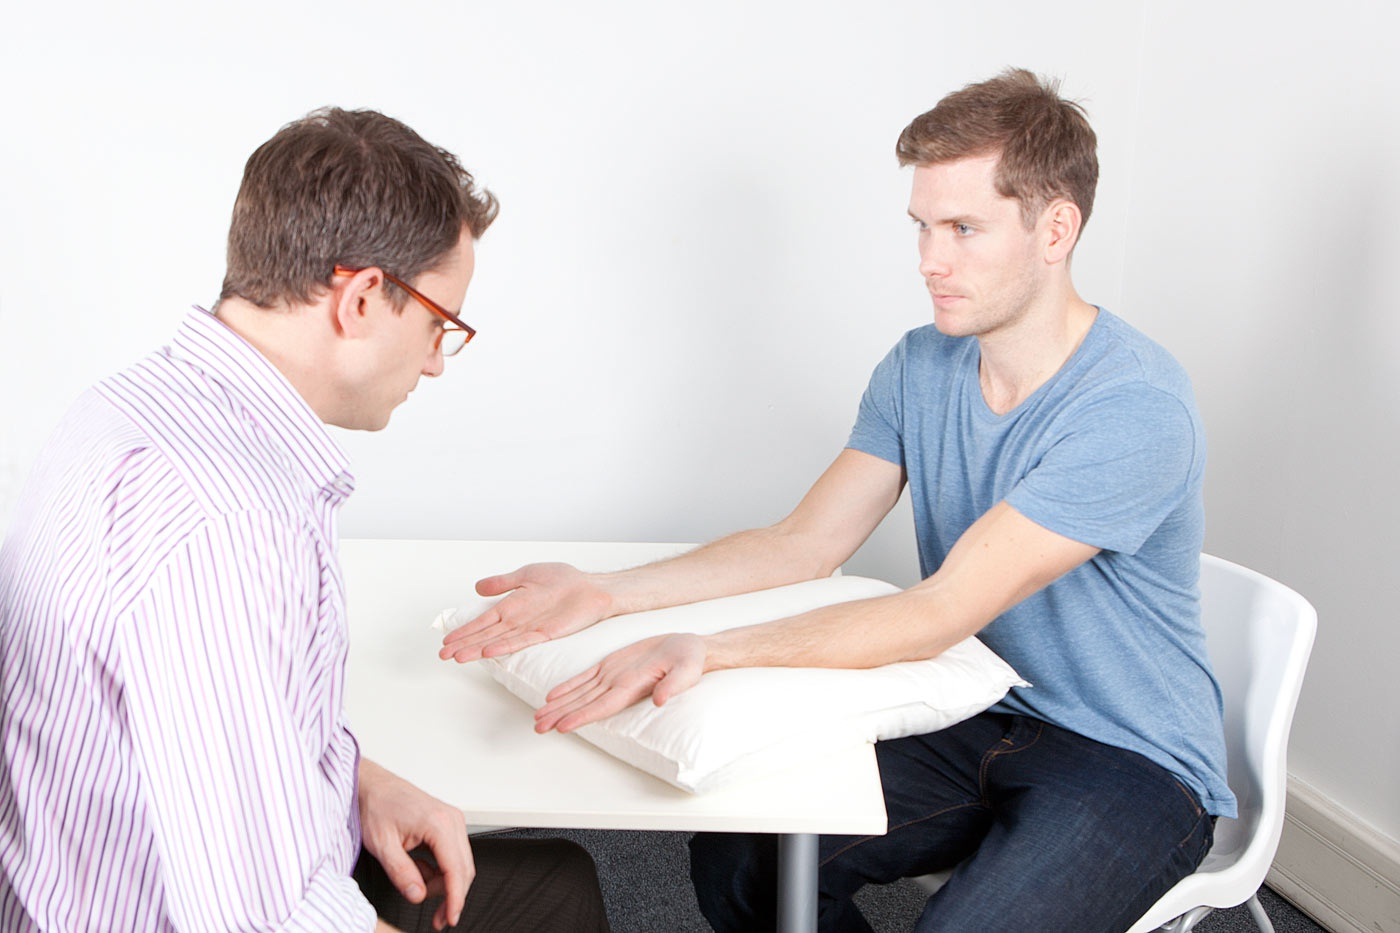 medicolegal assessments